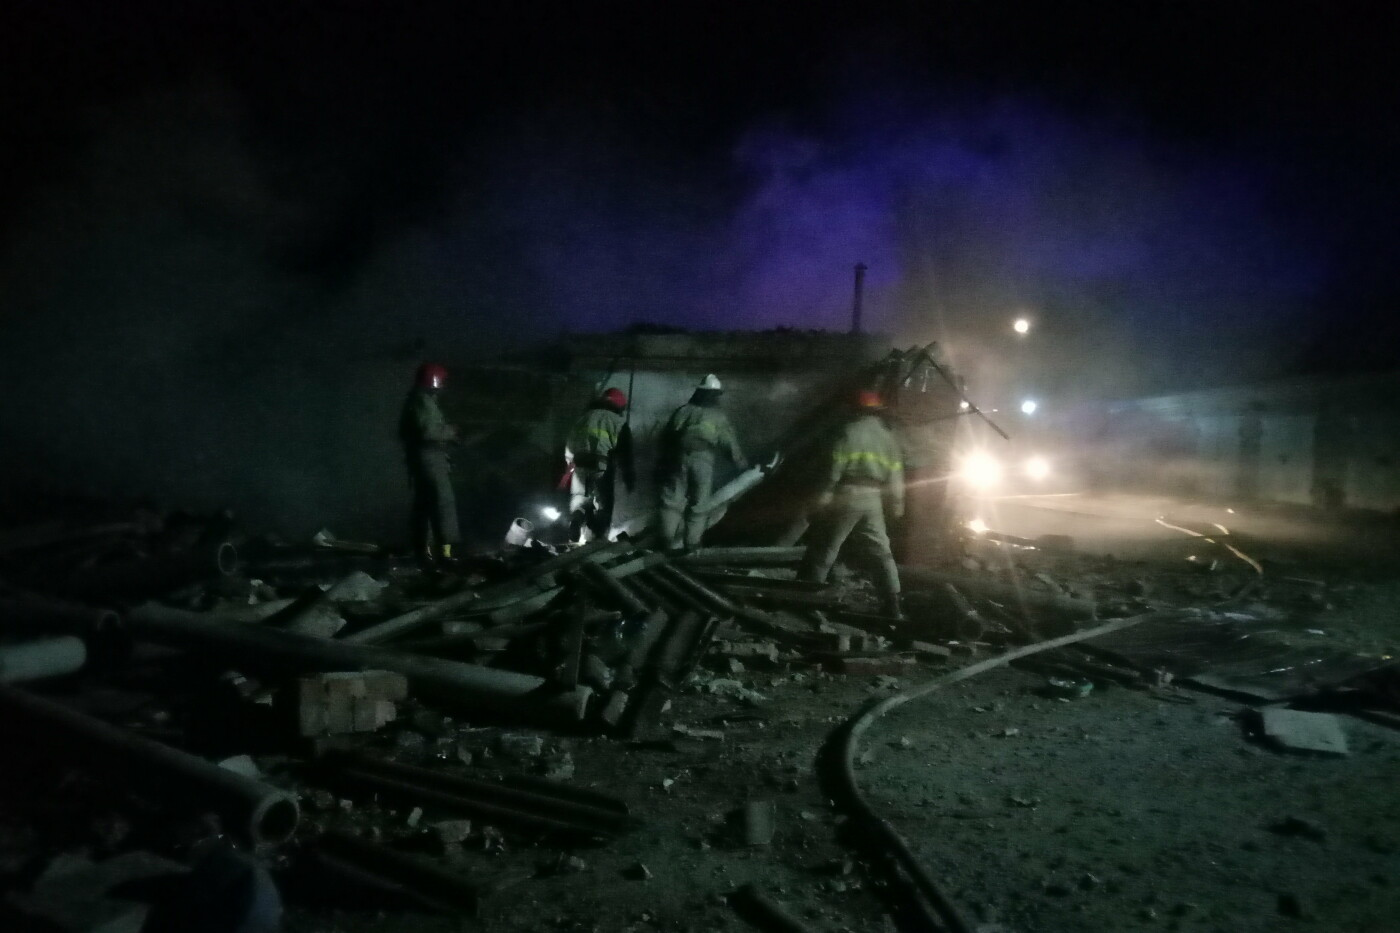 На Харьковщине из-за поджога гаражного кооператива произошел взрыв, - ФОТО, фото-2